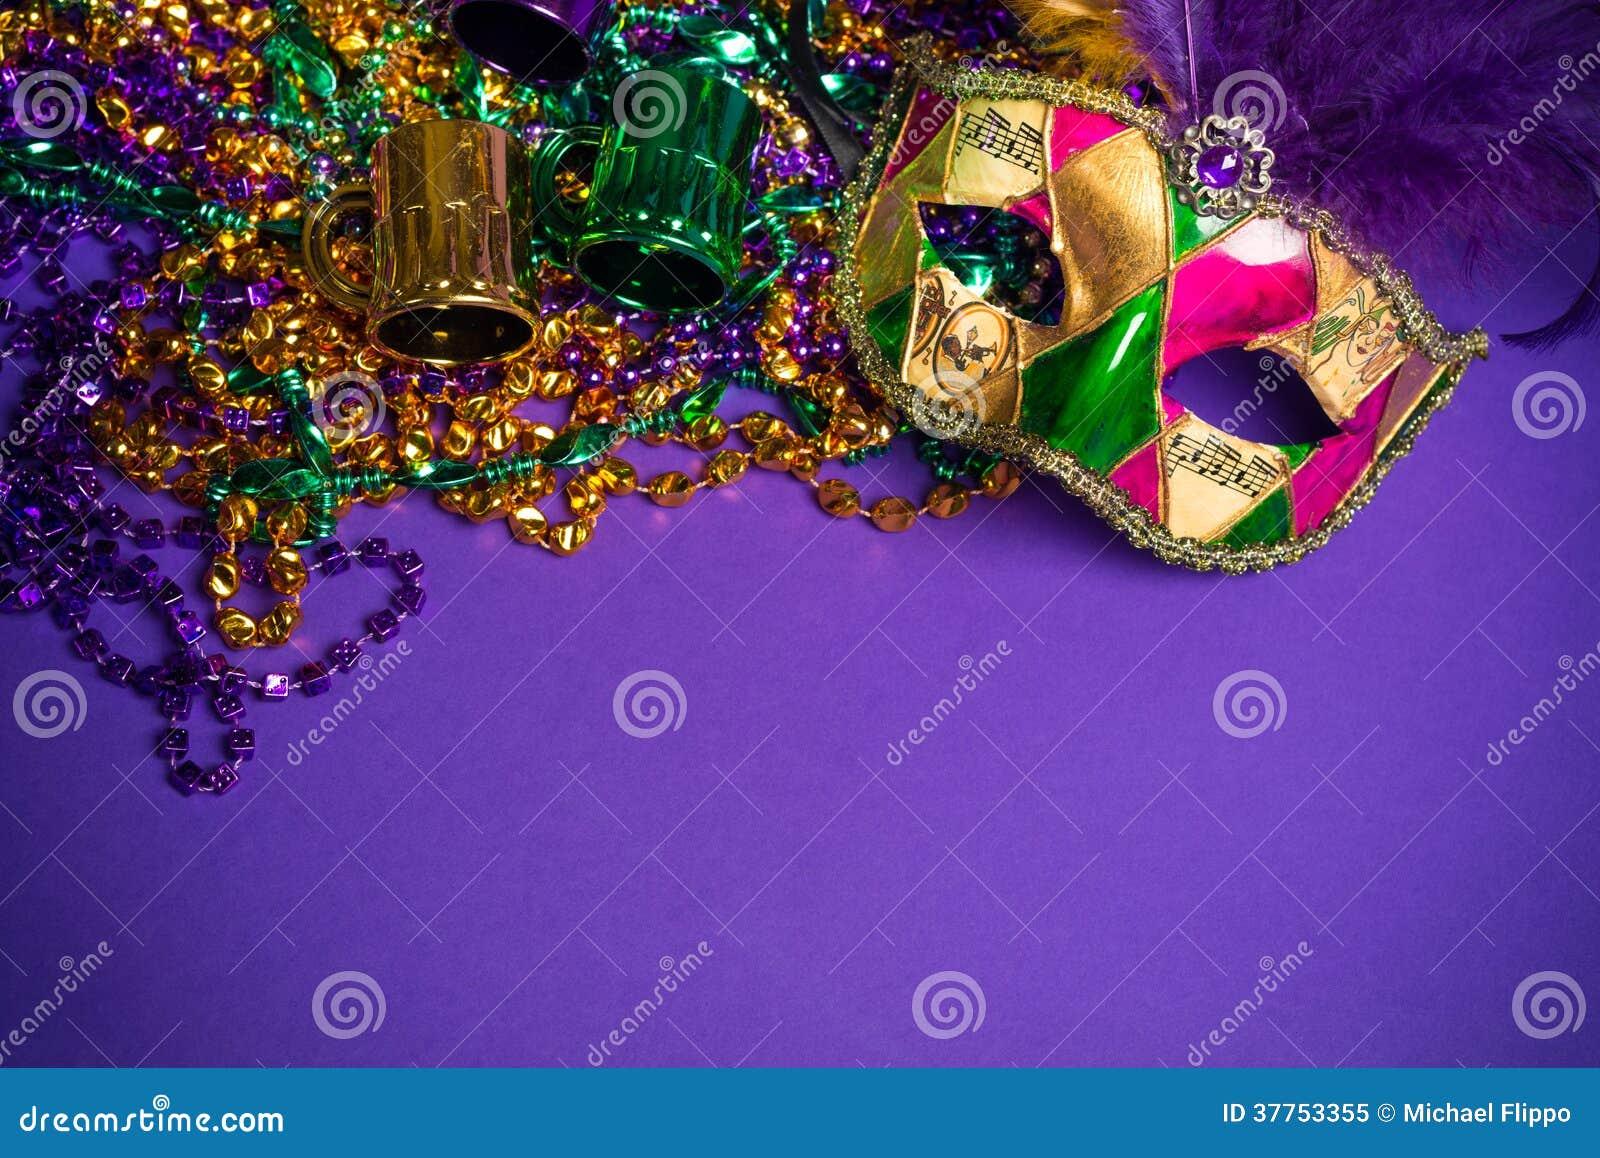 Maschera assortita di Carnivale o di Mardi Gras su un fondo porpora